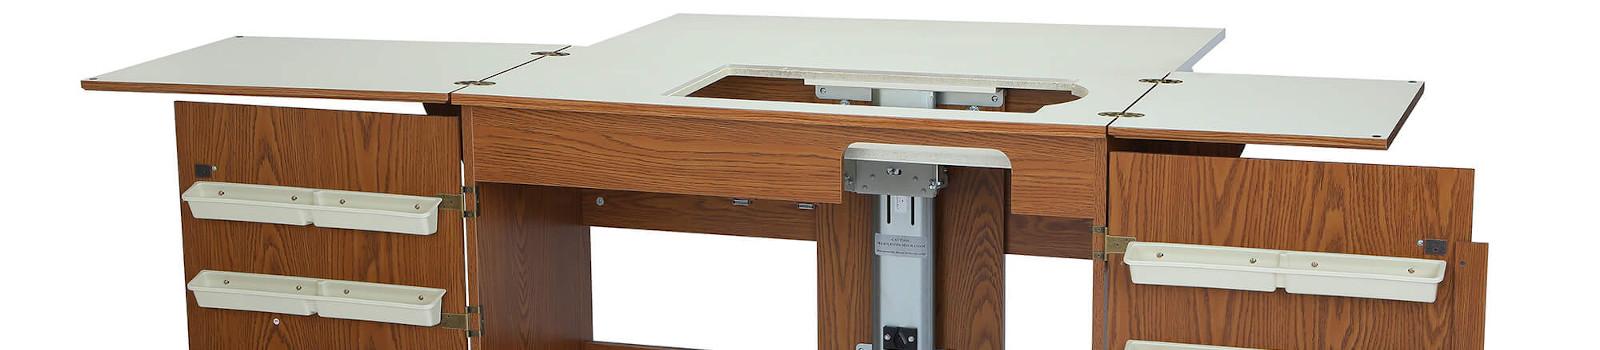 Arrow Bertha Cabinet